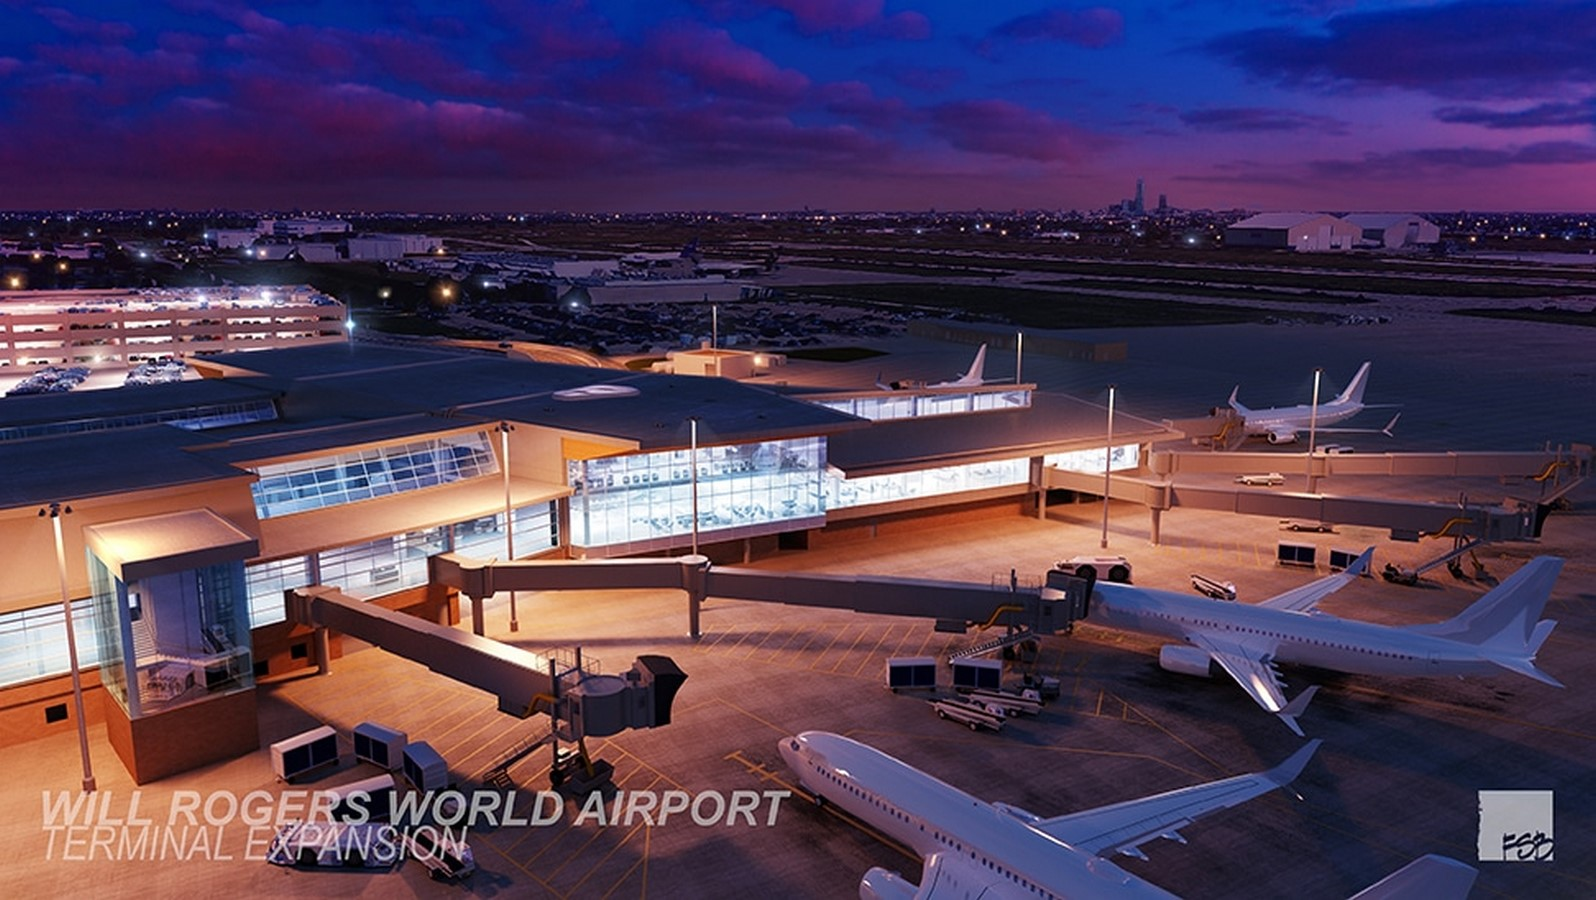 Will Rogers World Airport: Heading Forward - Sheet2